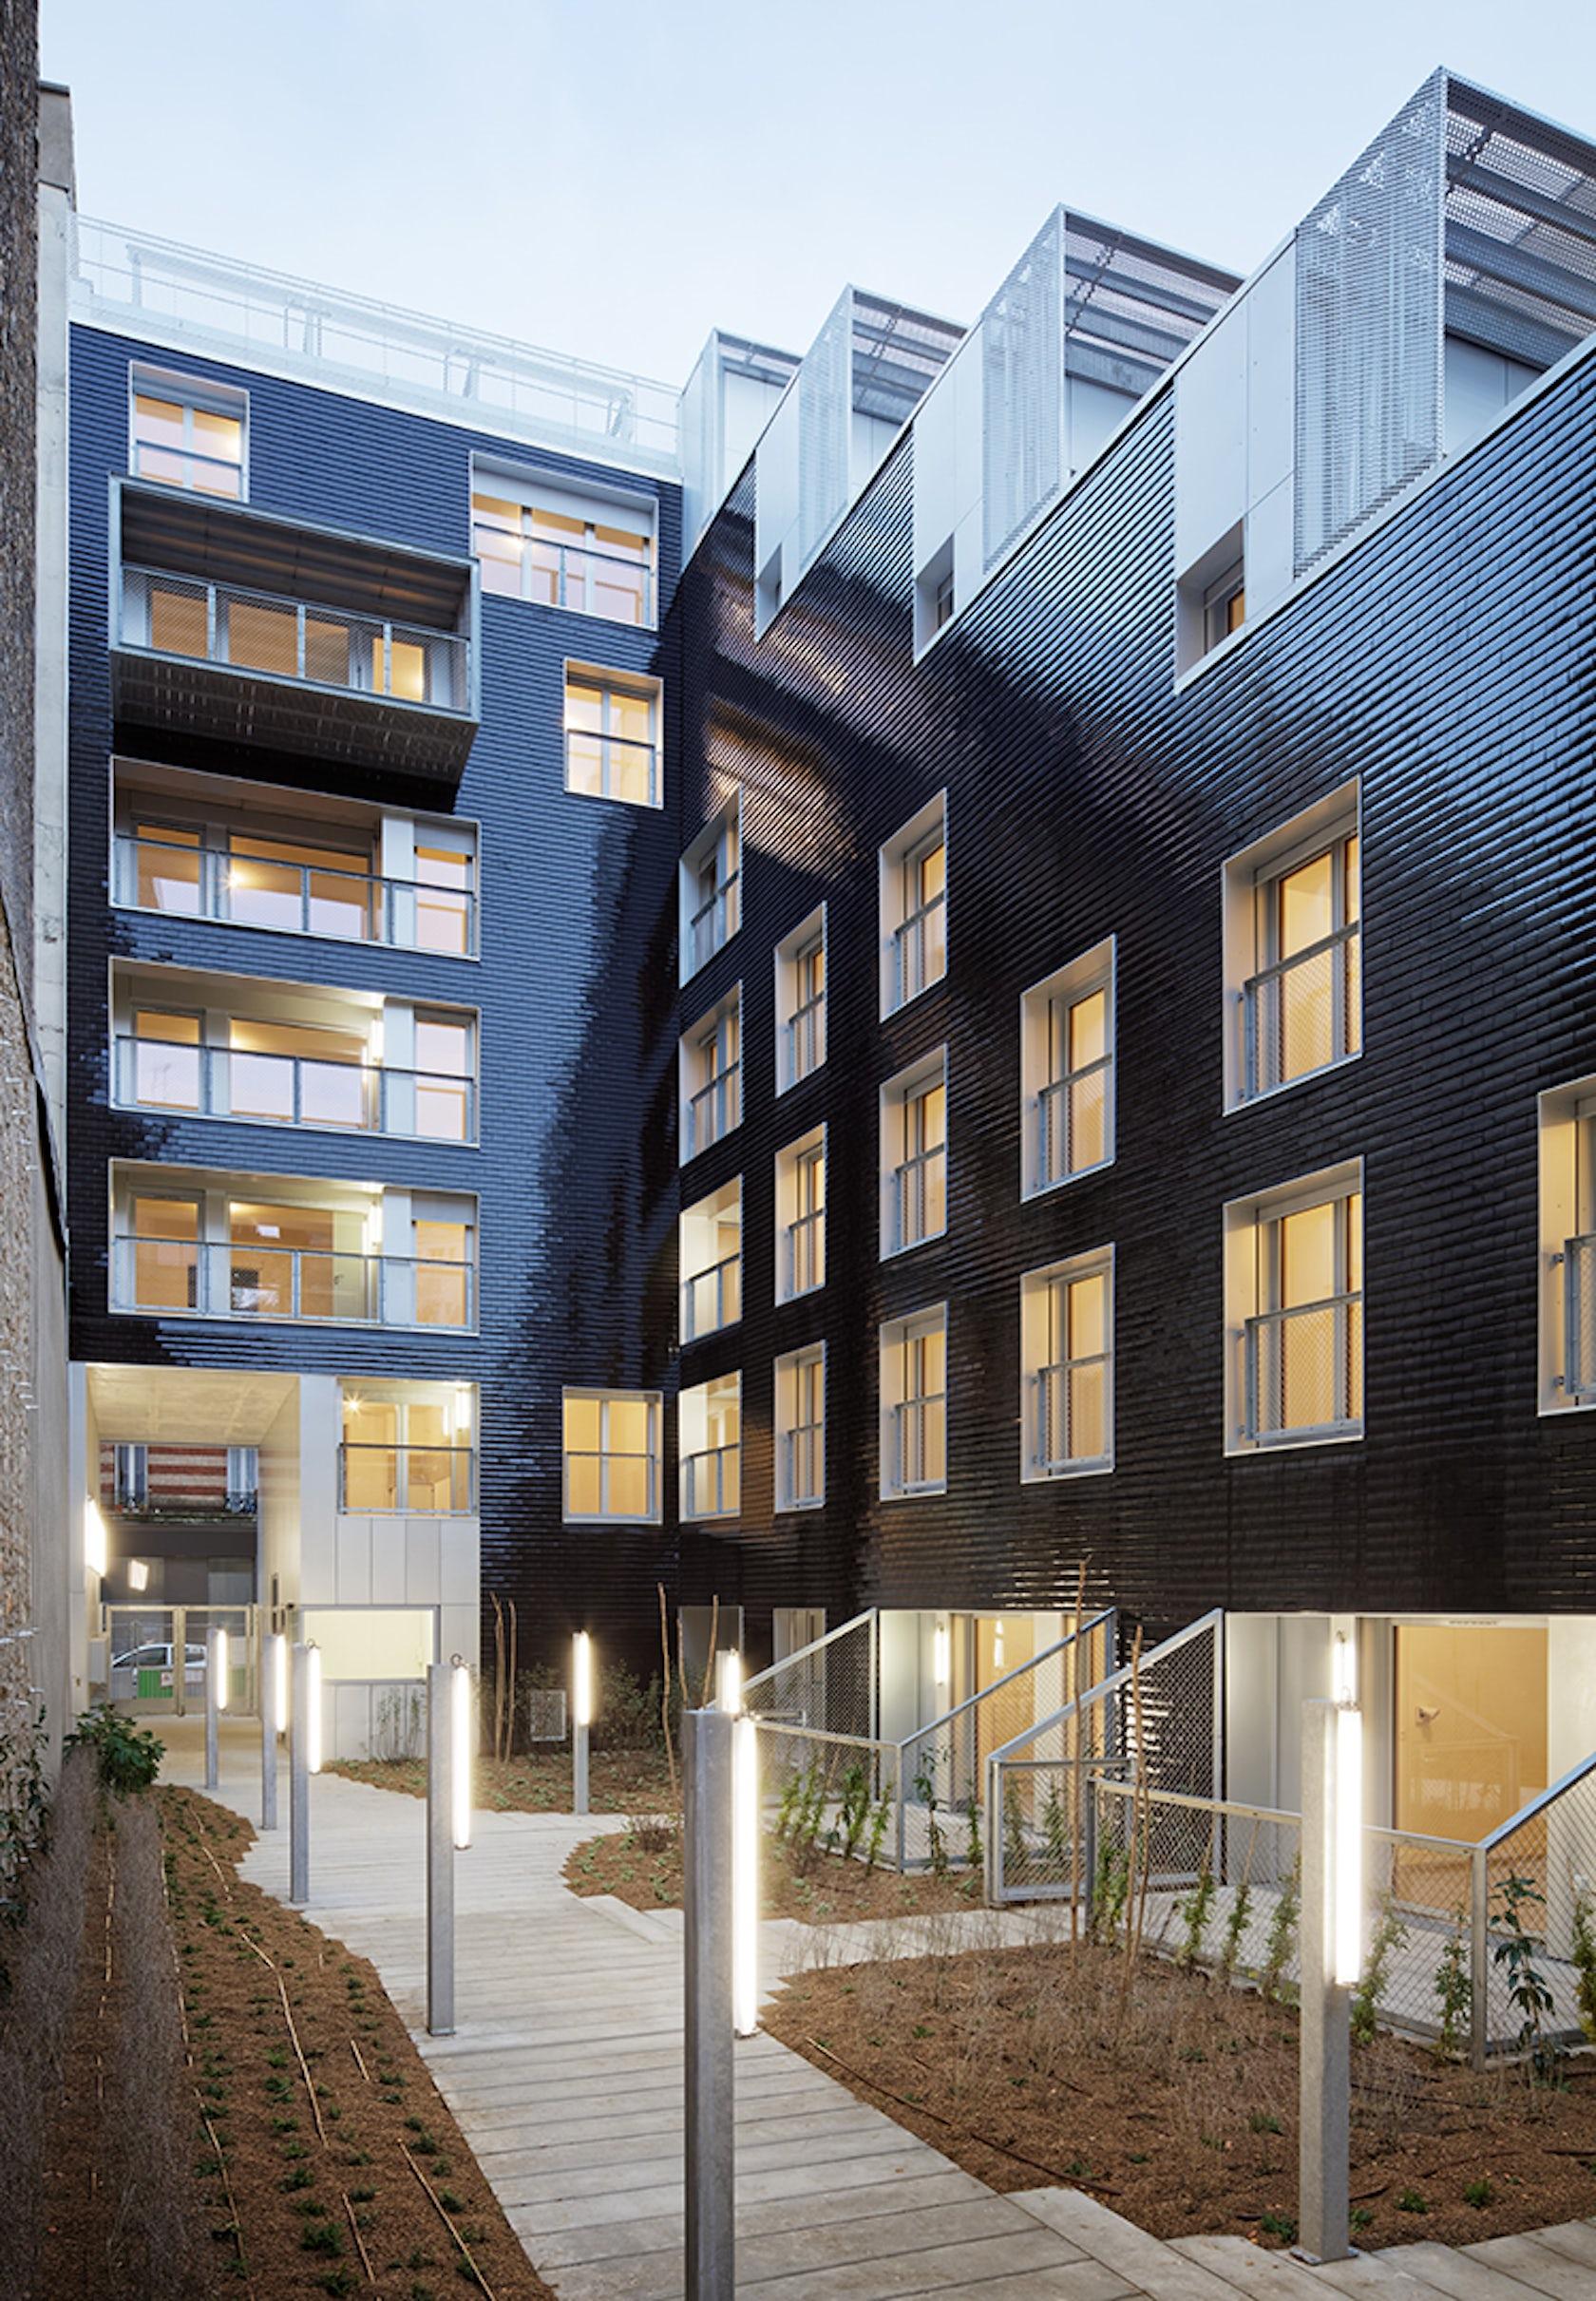 social housing units in paris france architizer. Black Bedroom Furniture Sets. Home Design Ideas